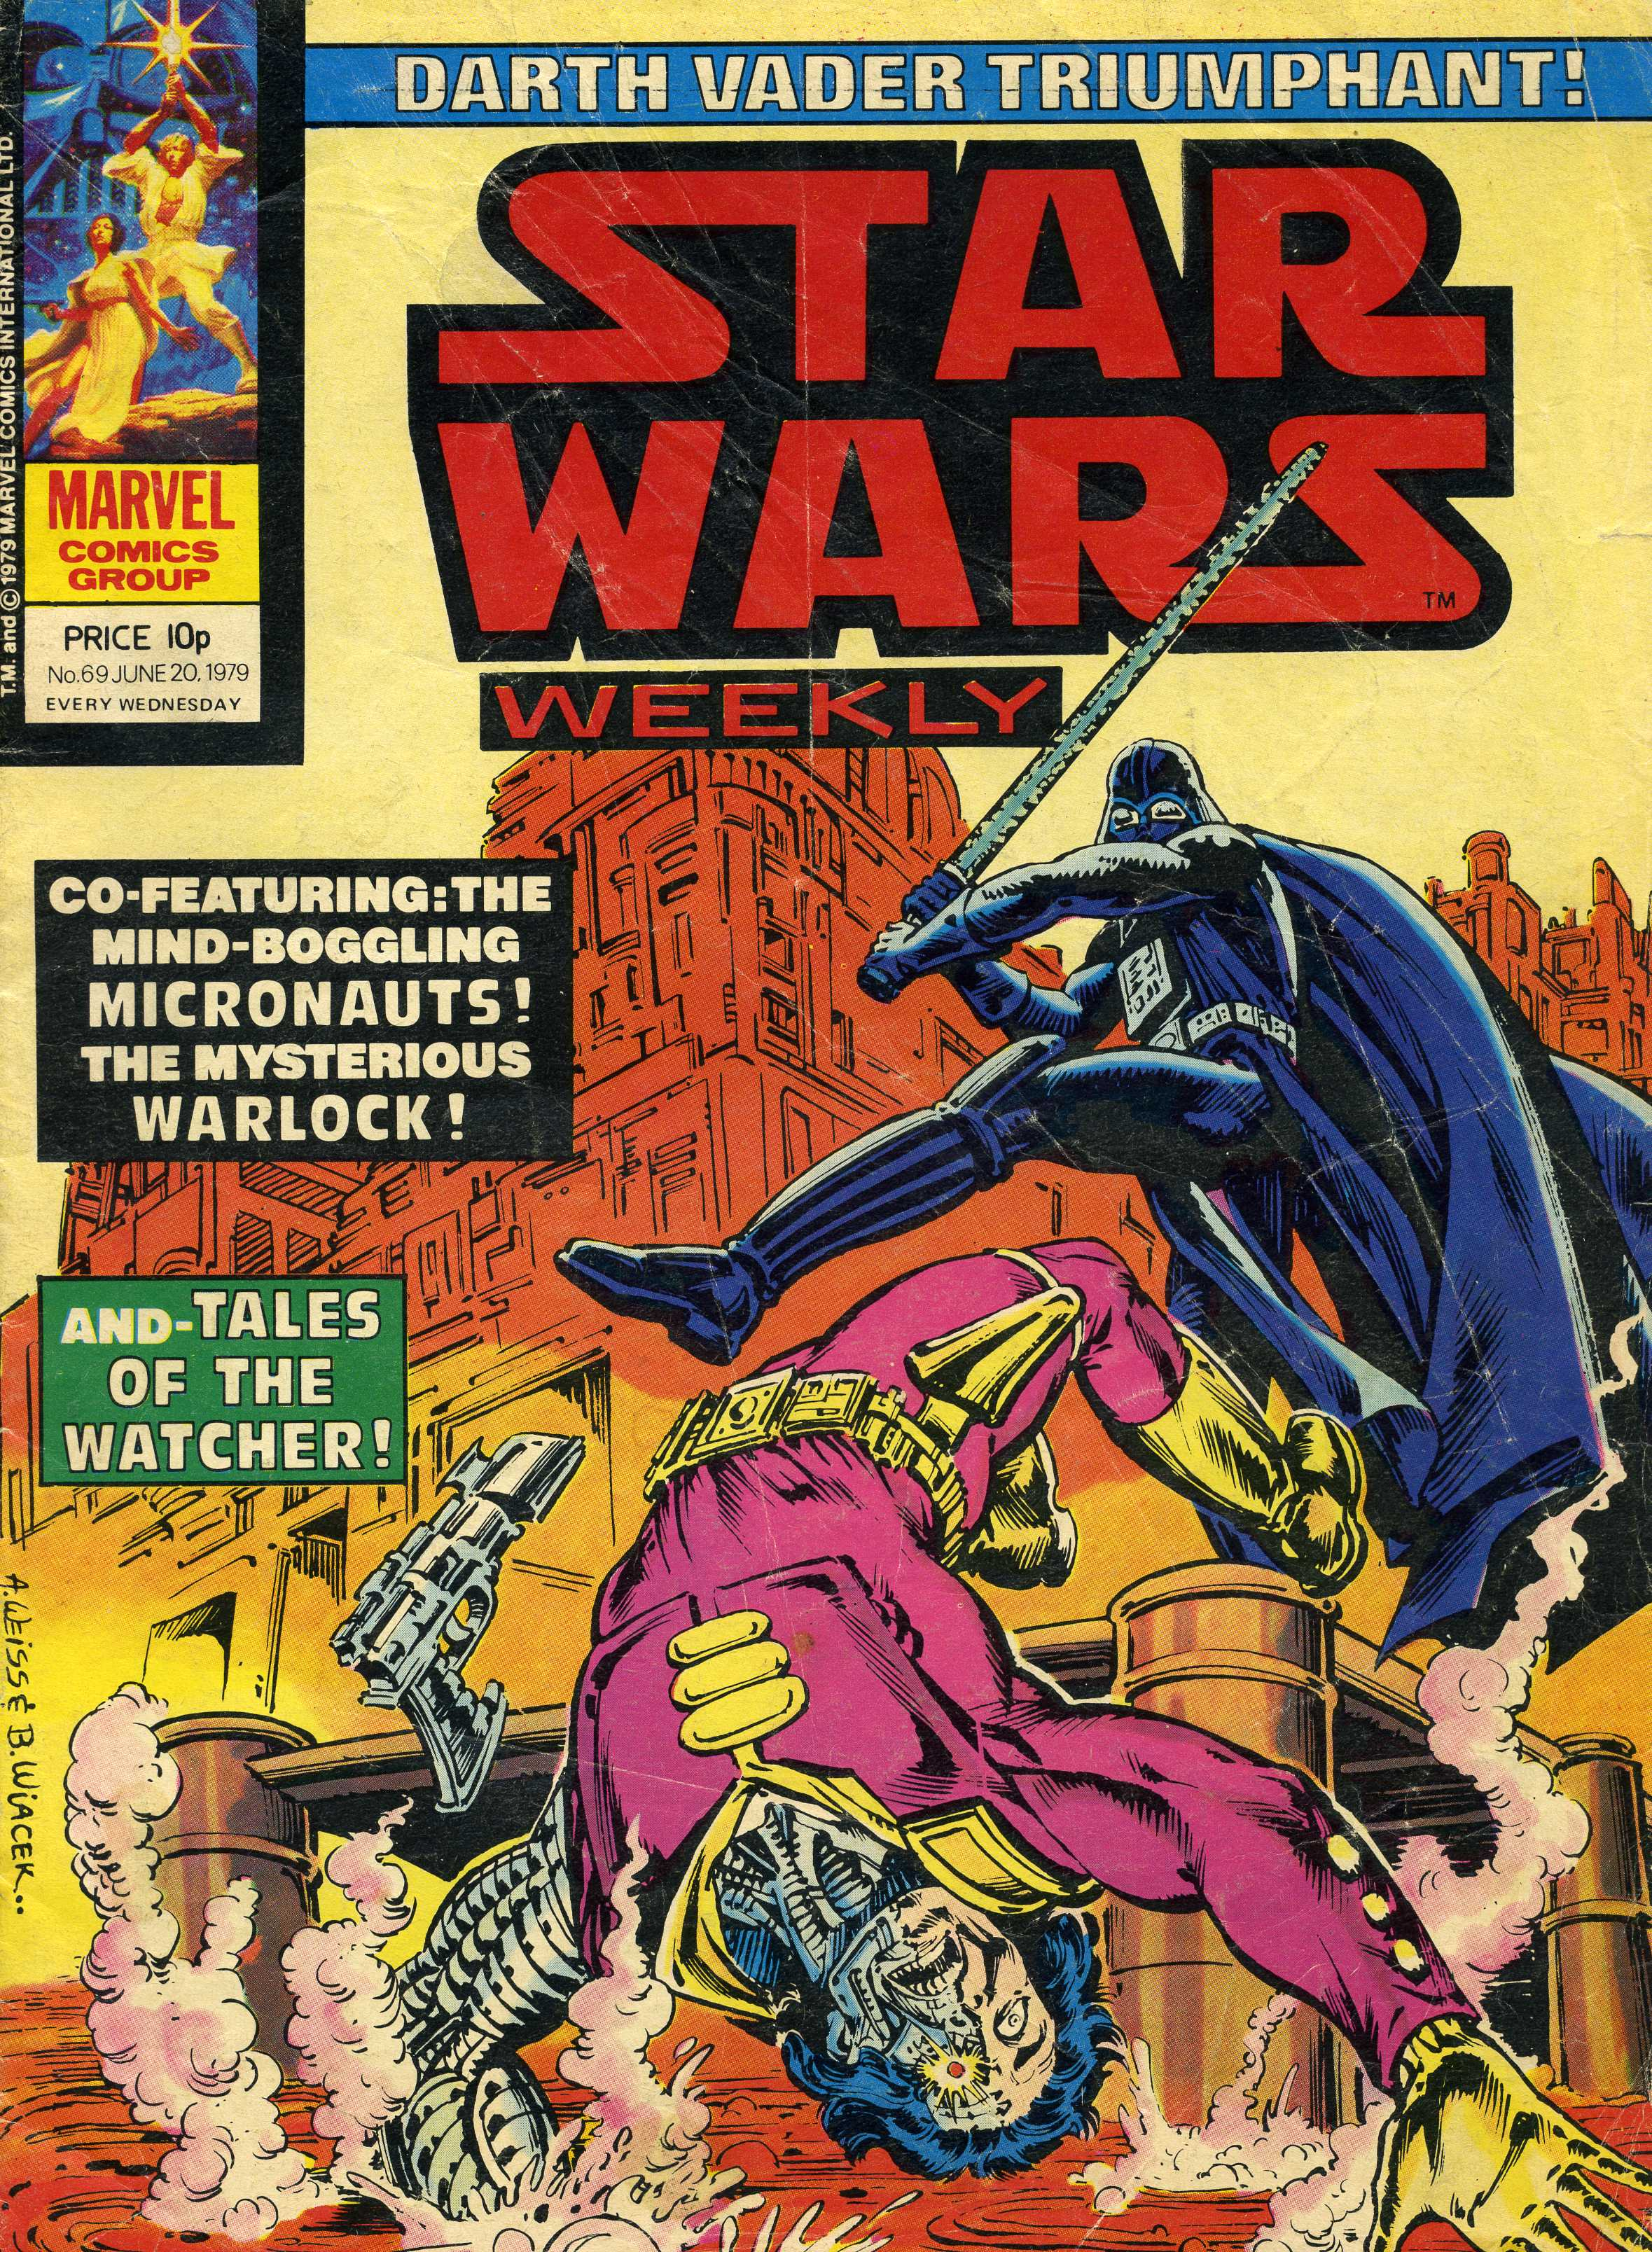 Star Wars Weekly 69